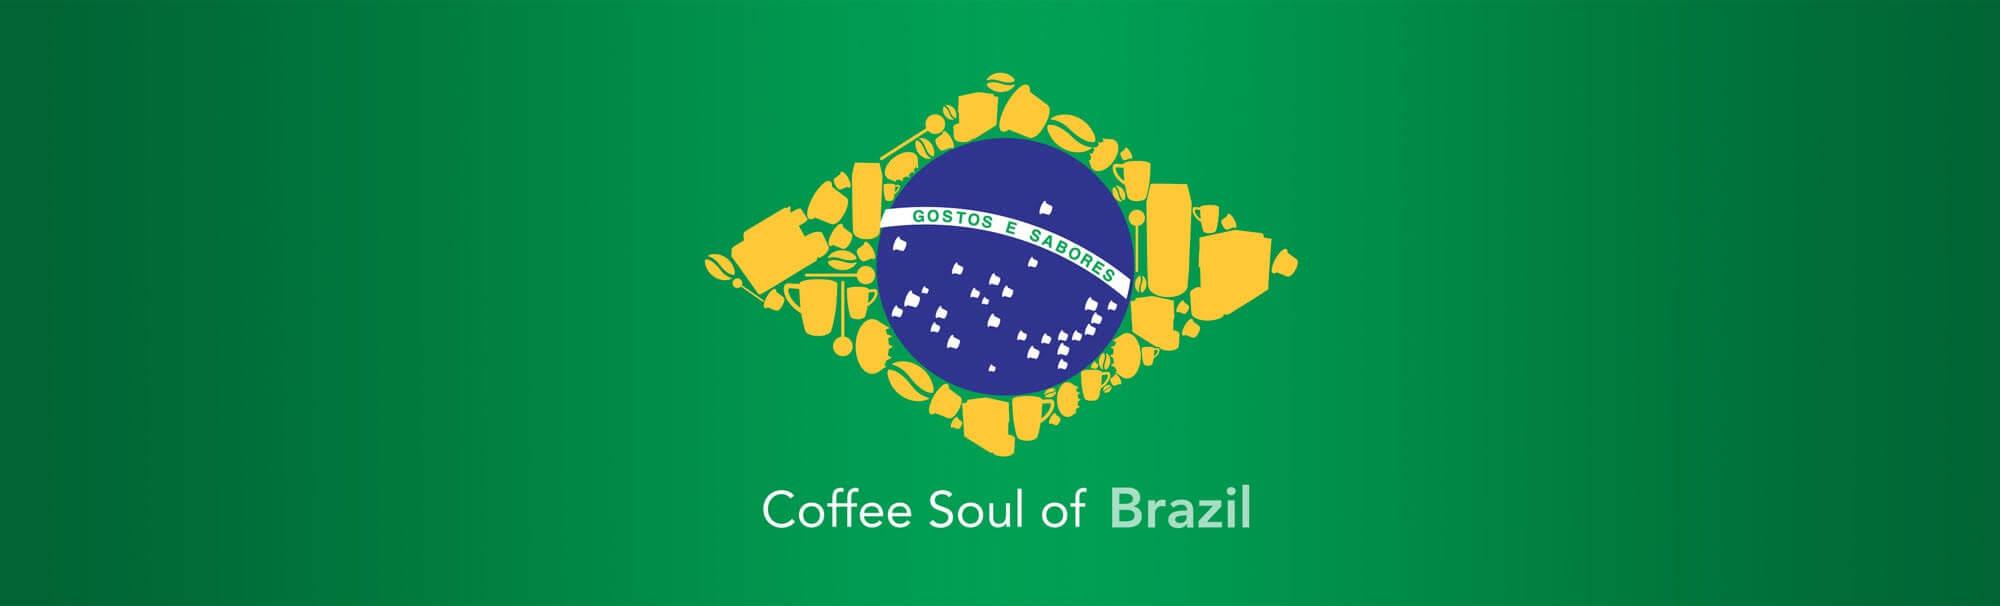 brazil_soul